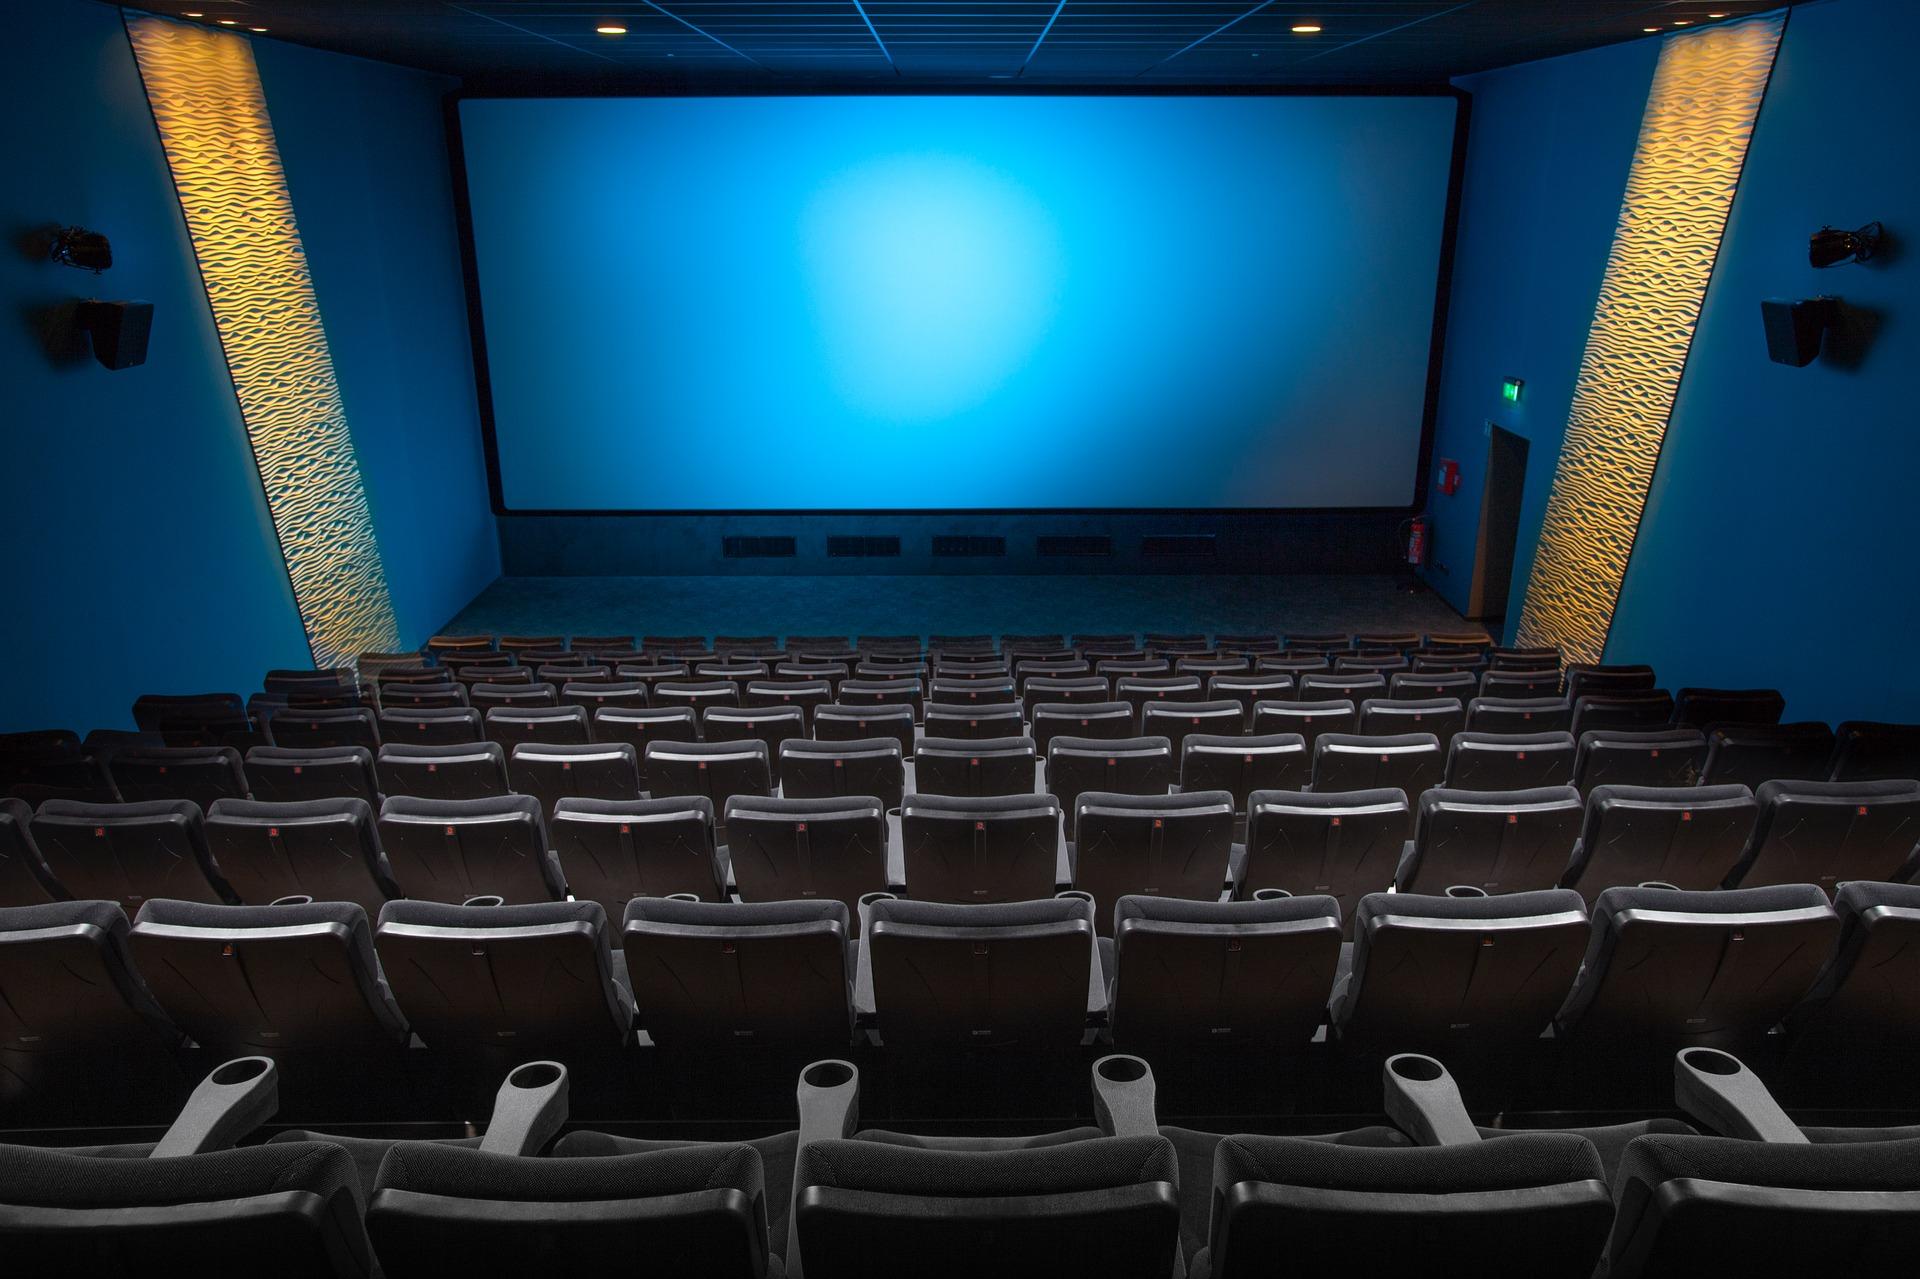 【パニック障害】映画館克服方法【認知行動療法】